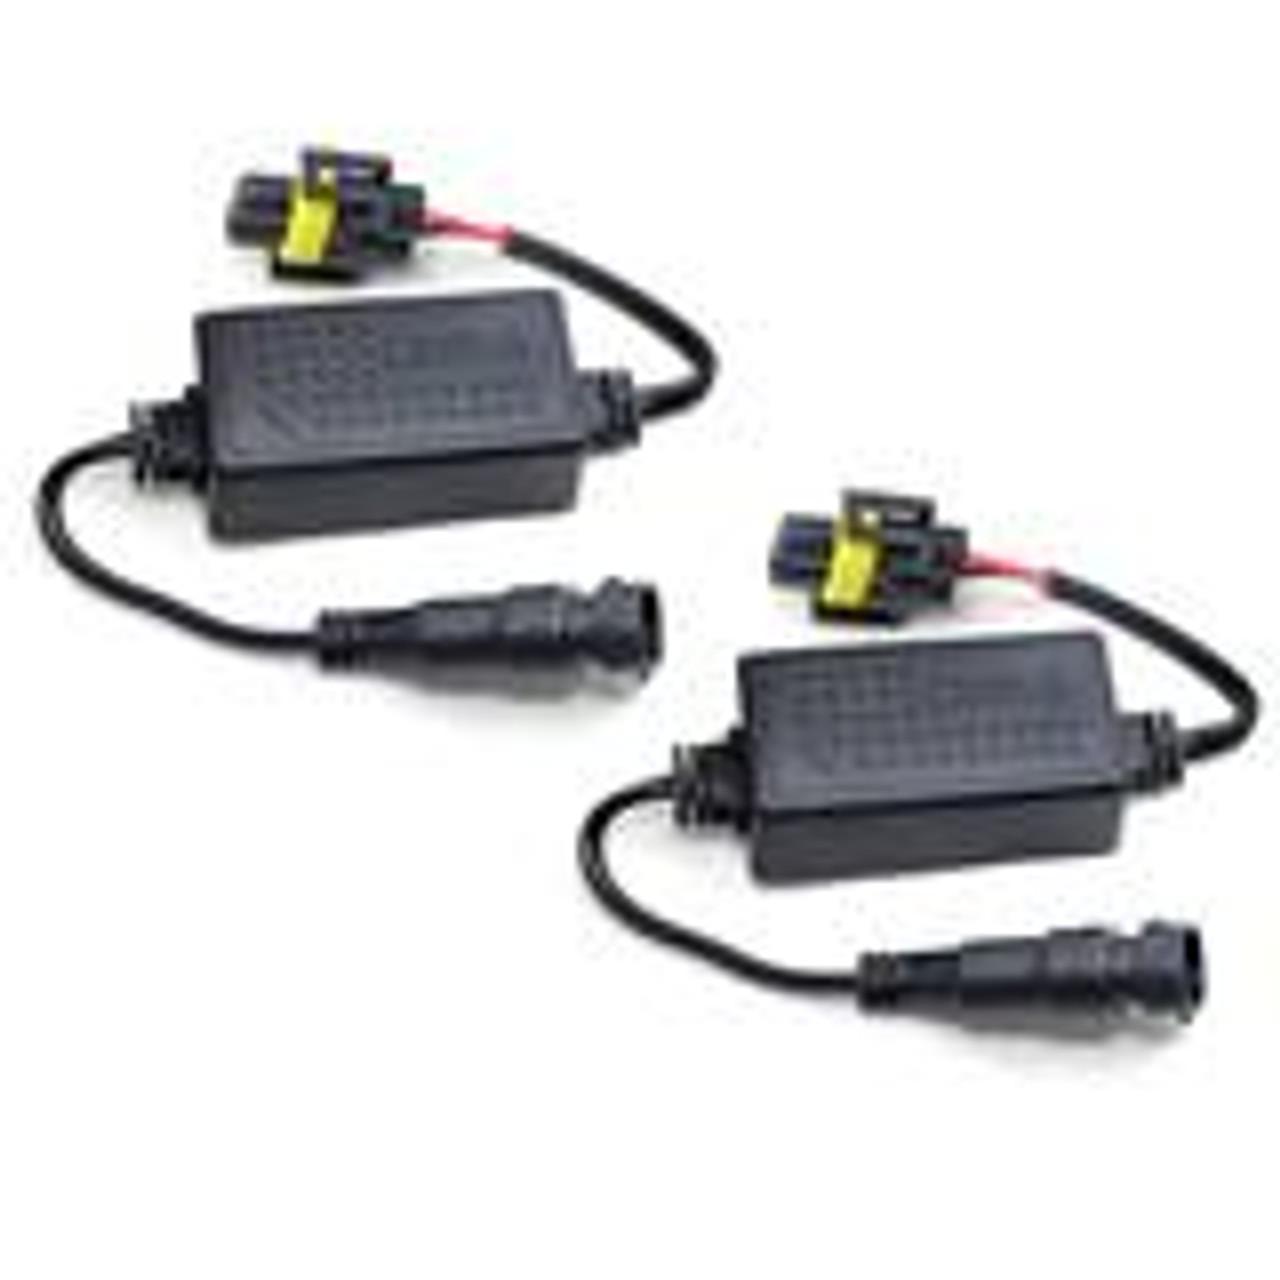 9007 Led Headlight Decoder Canbus Resistor Anti-Flicker Harness LED Bulbs Decoder